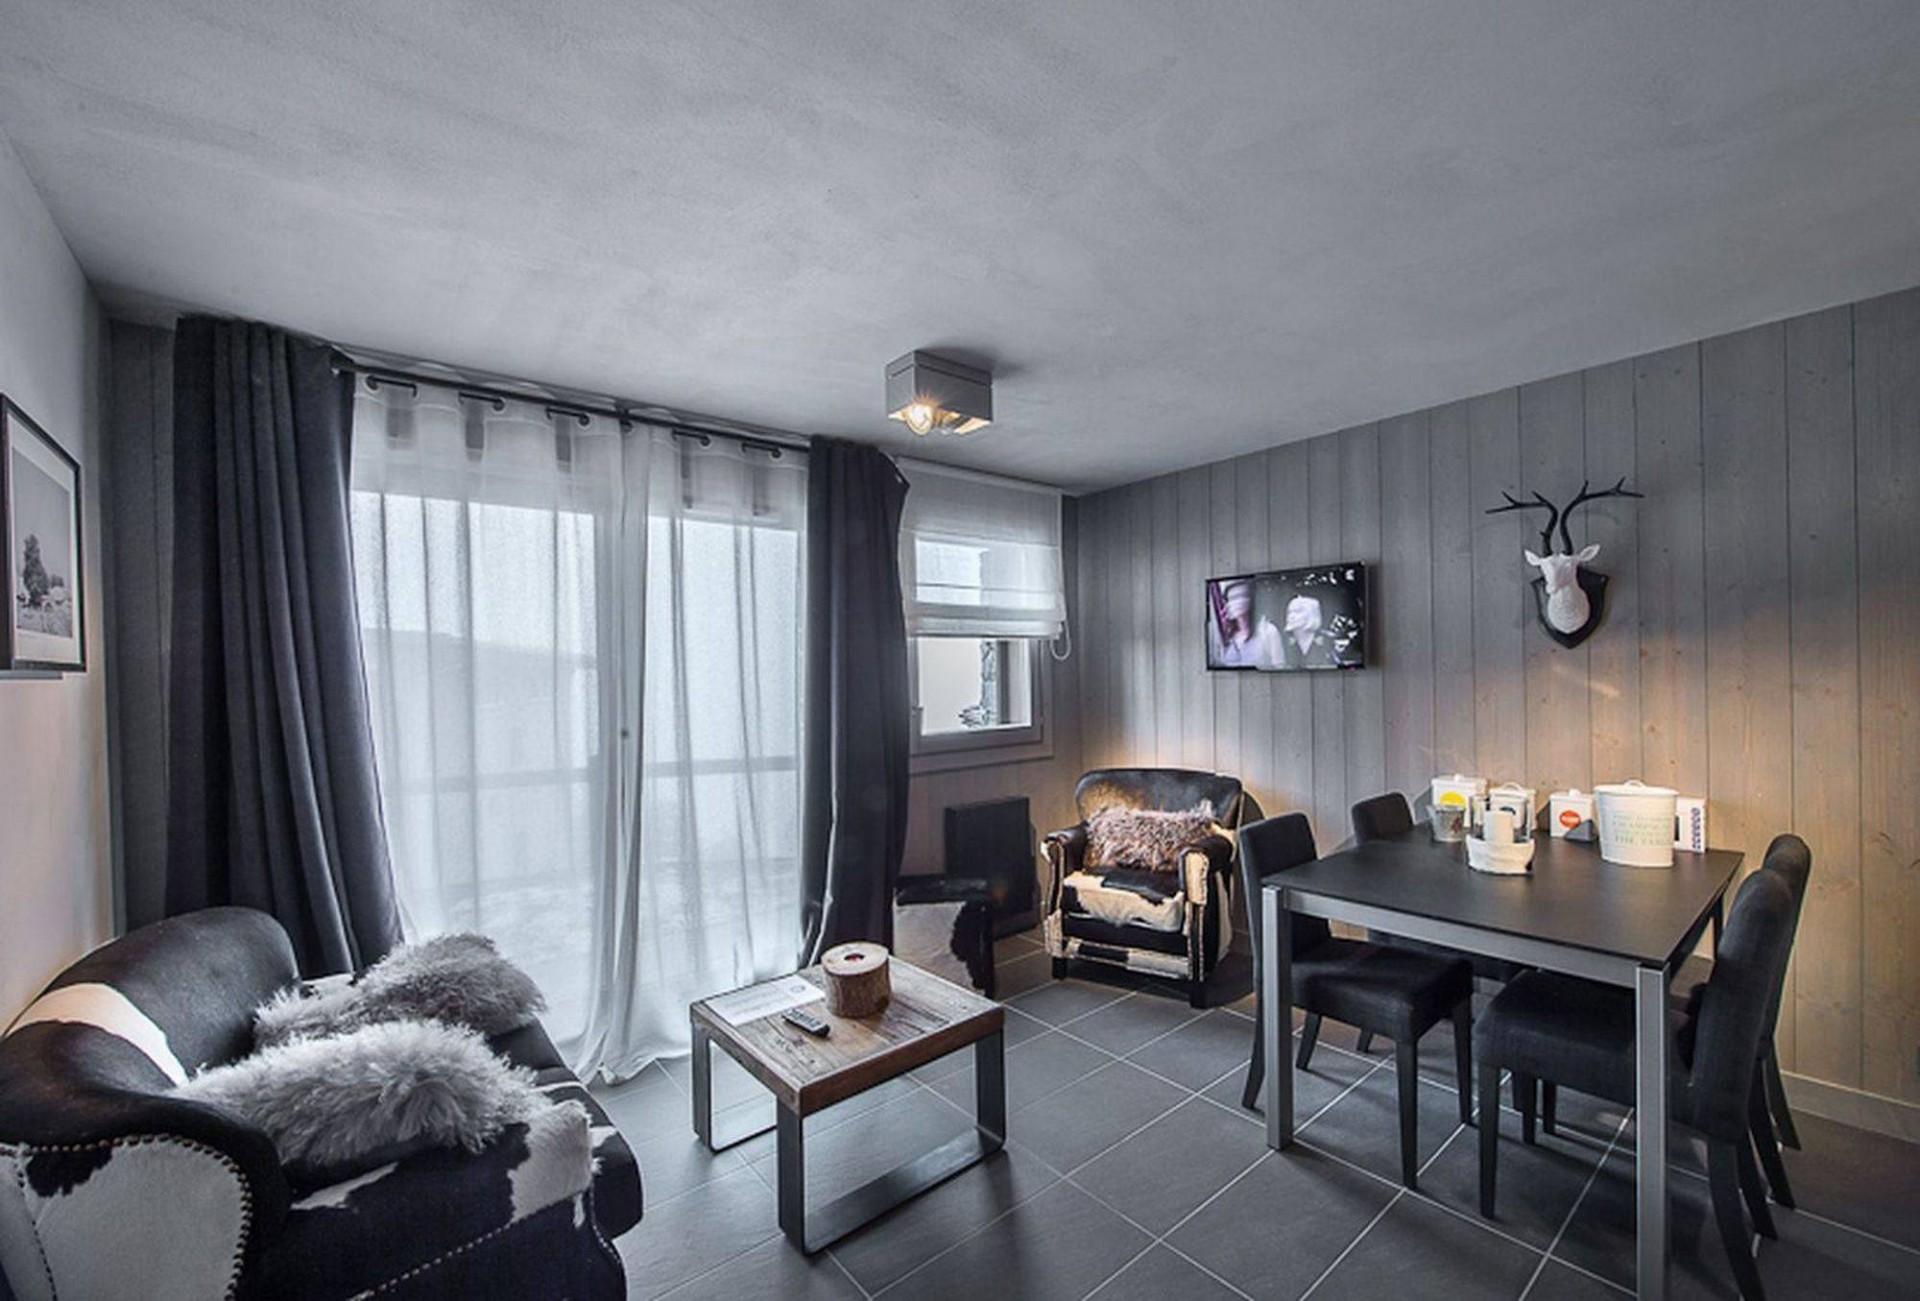 Courchevel 1650 Location Appartement Luxe Doredo Séjour 2